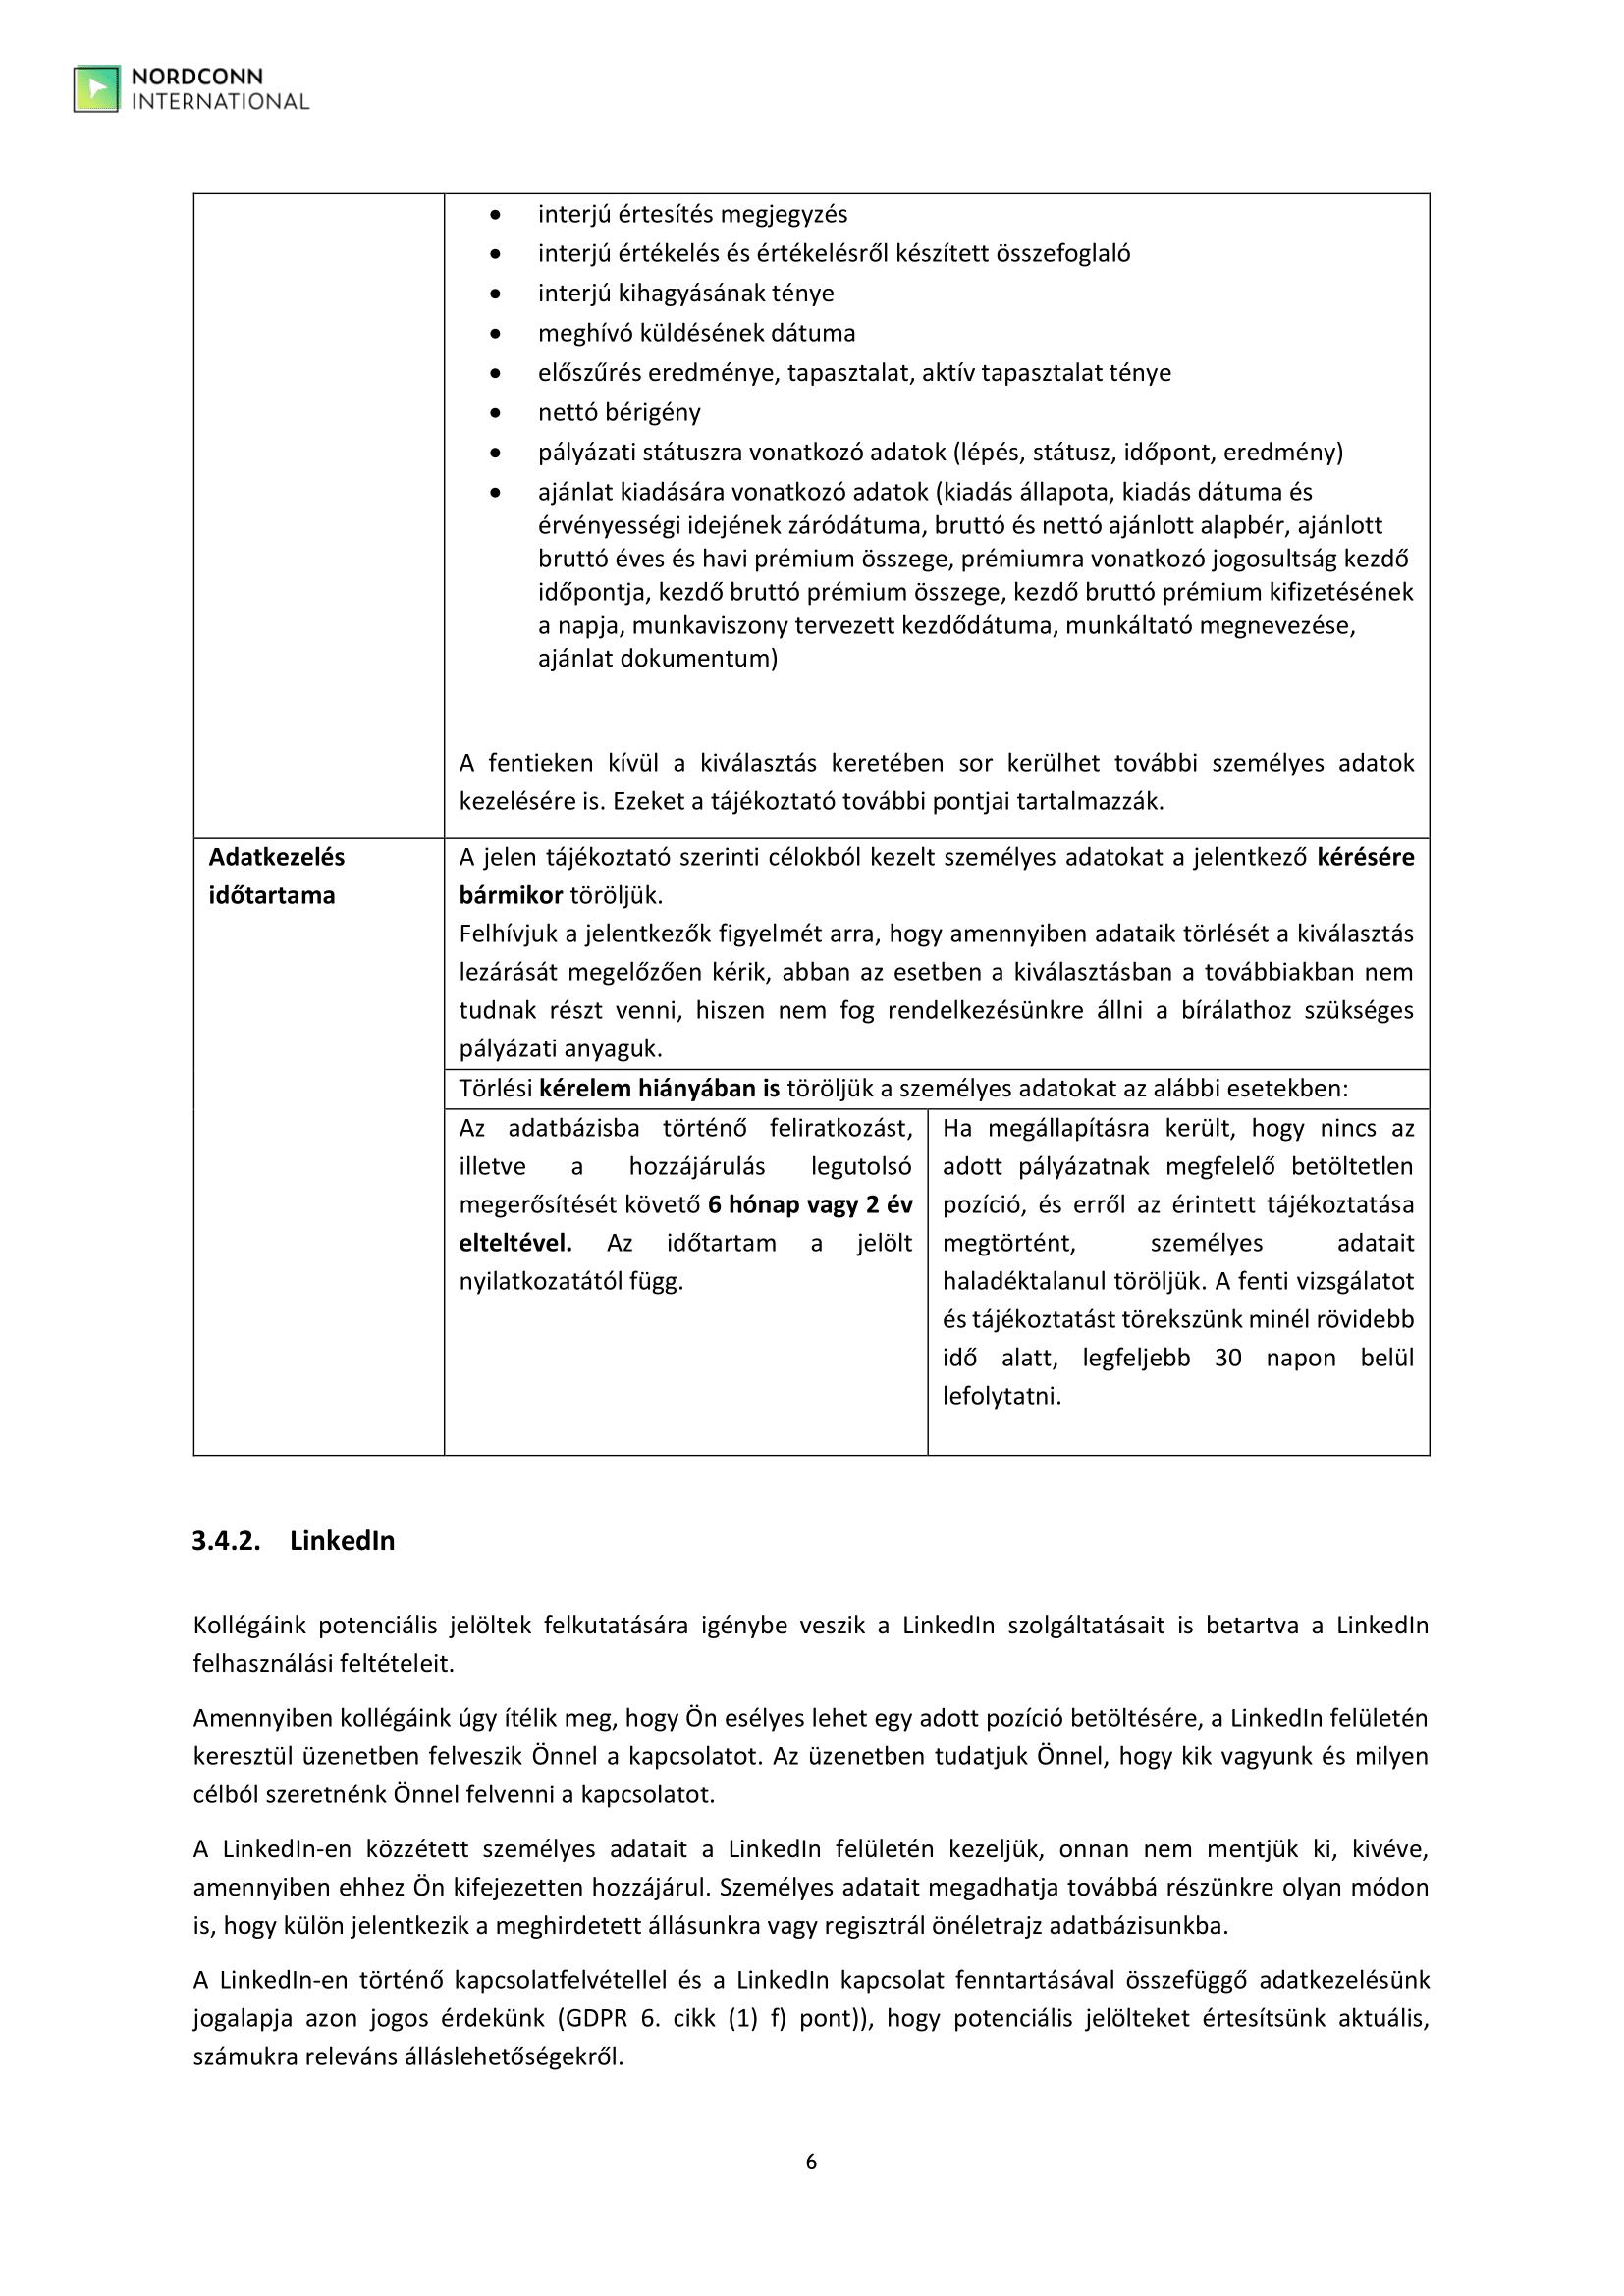 Adatkezelesi_06